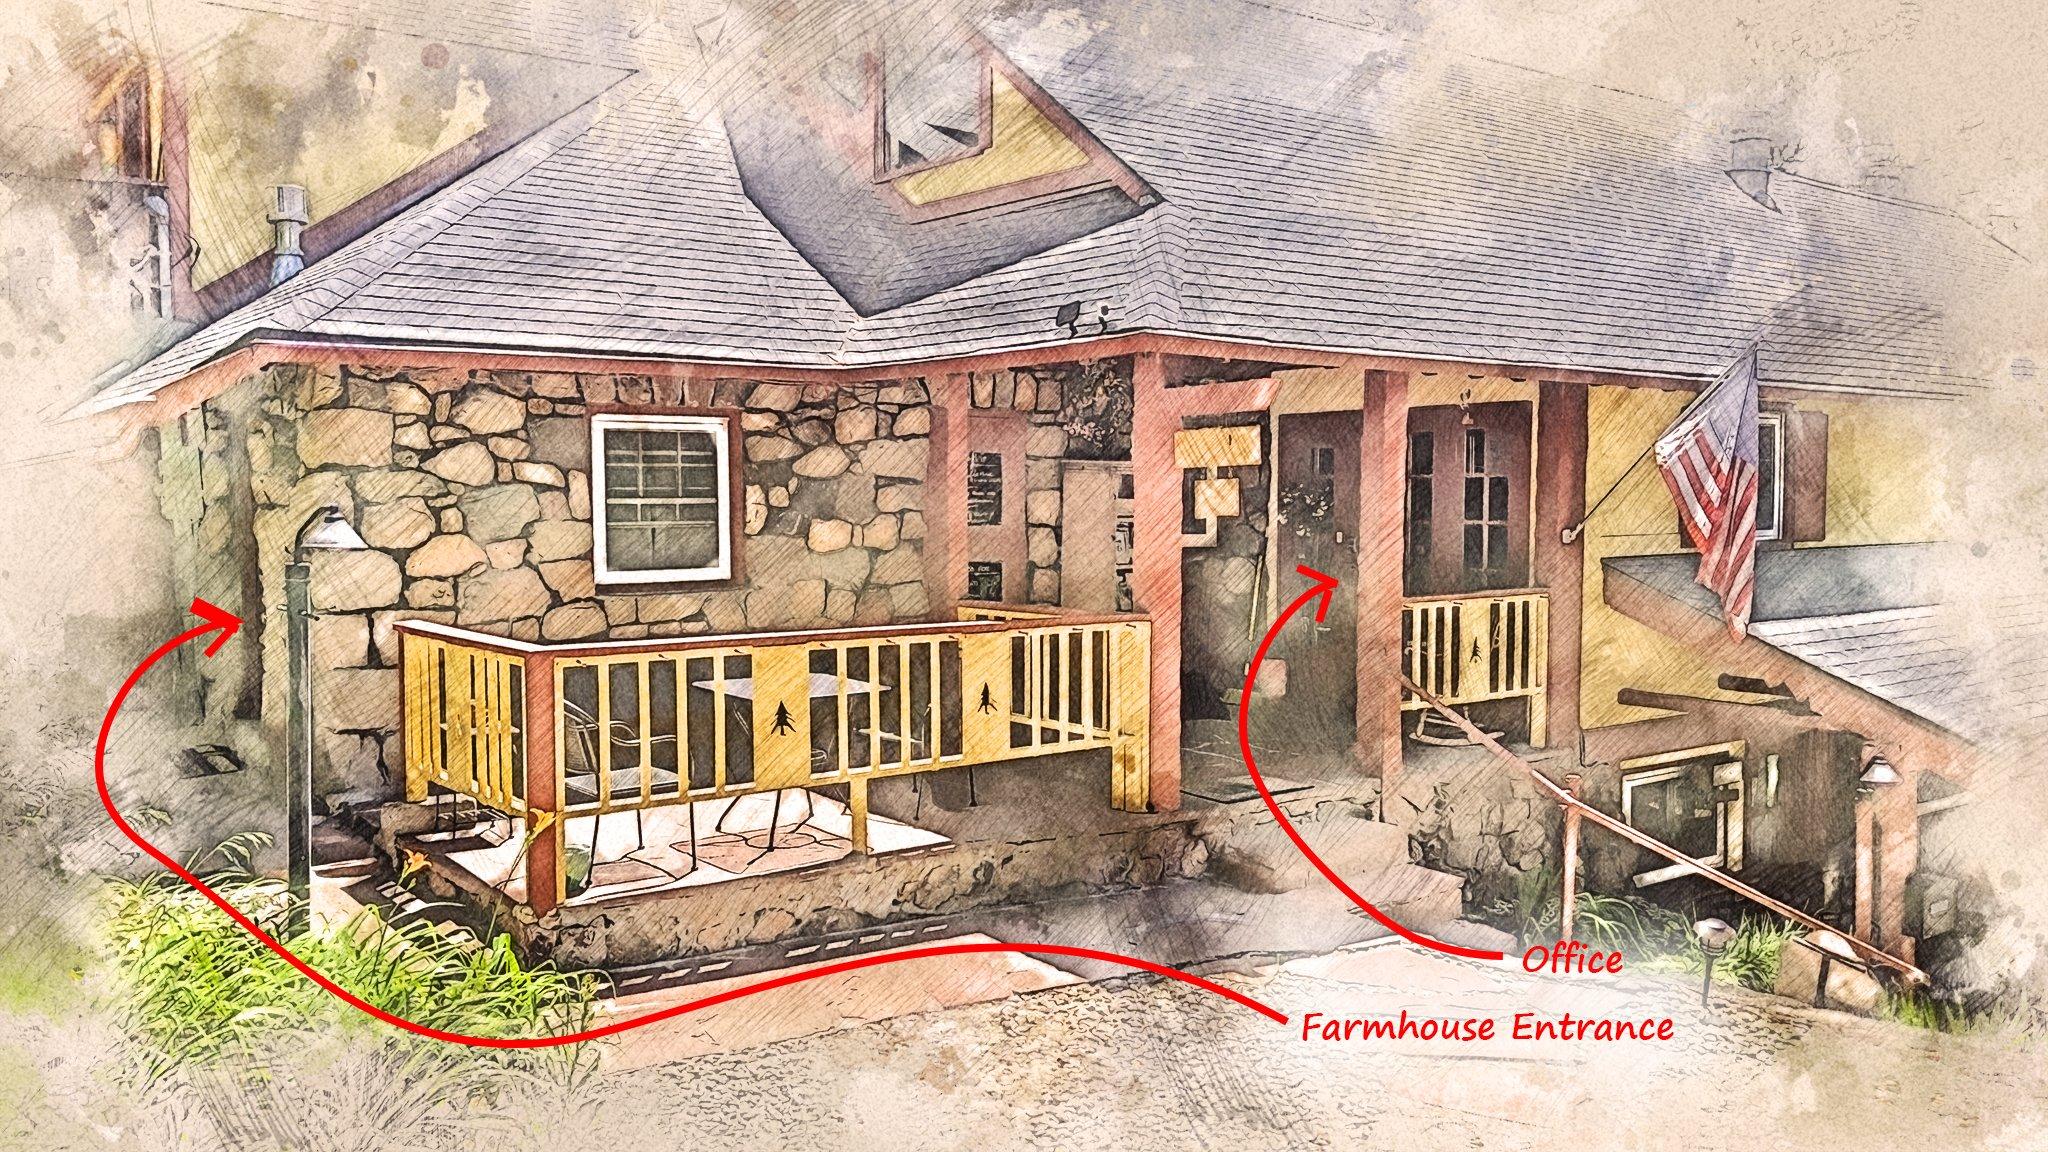 Farmhouse Room and Office Entrance